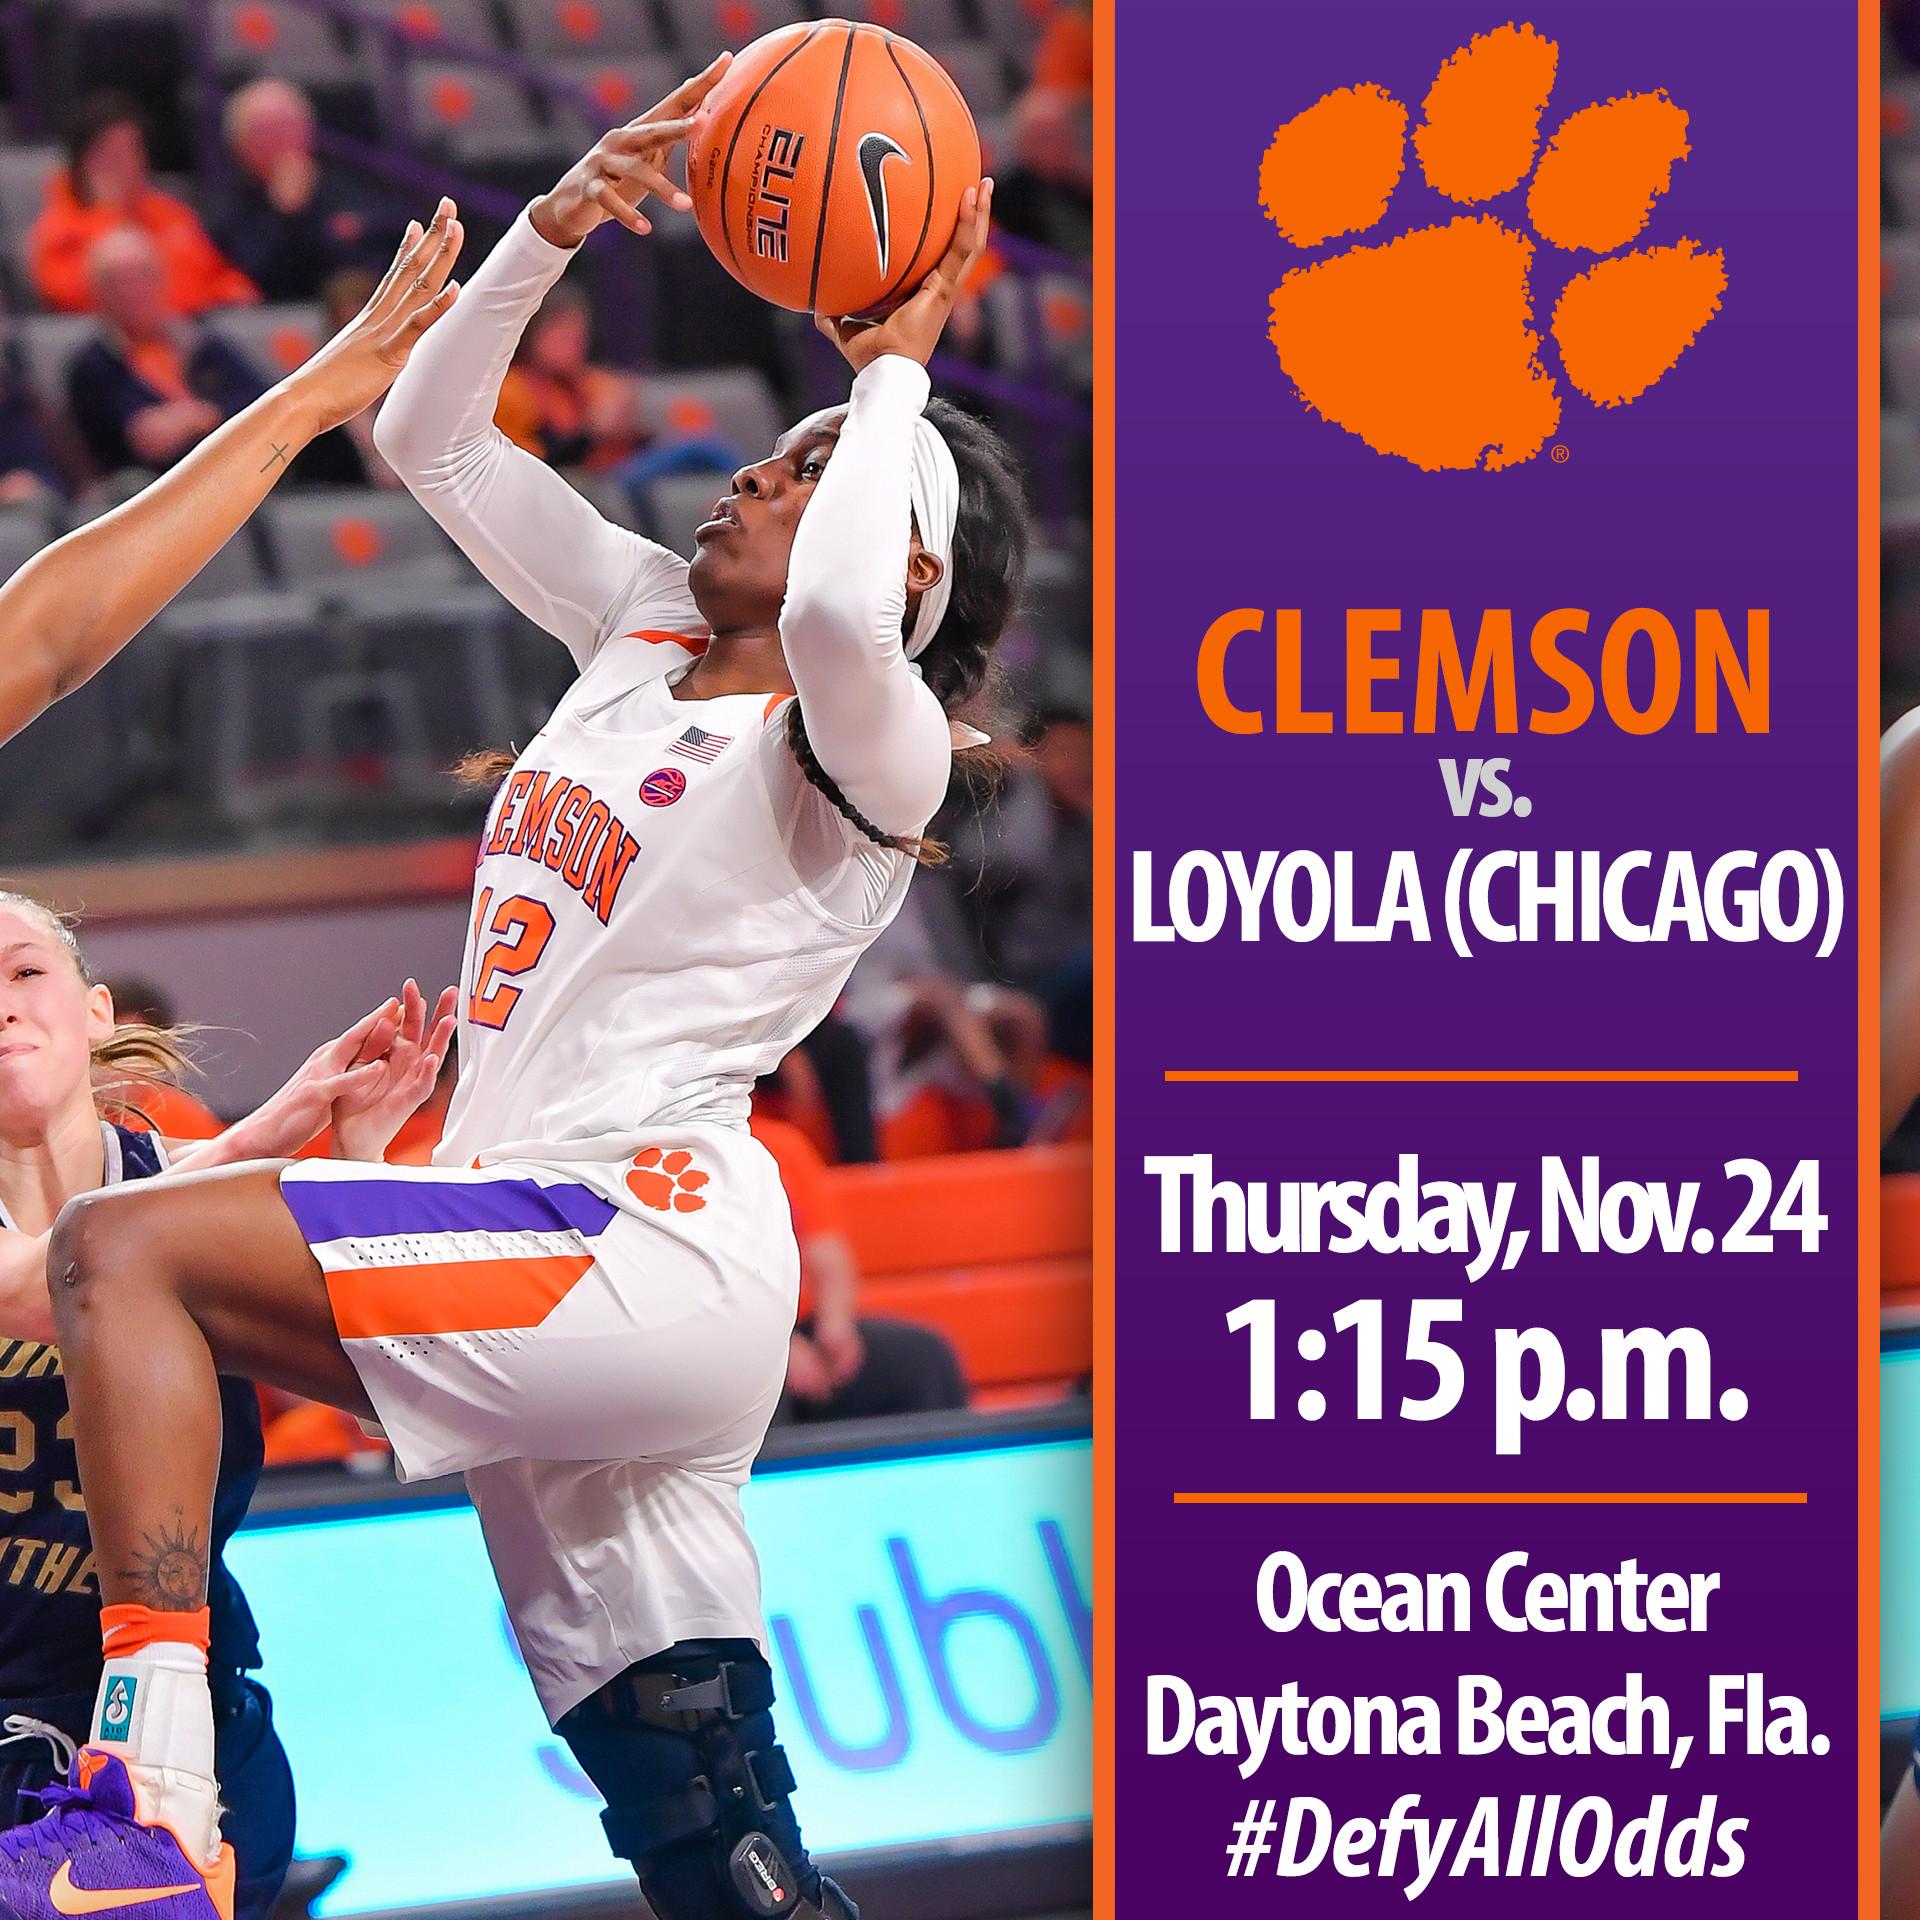 Clemson Faces Loyola (Chicago) & Wright State in Daytona Beach This Week